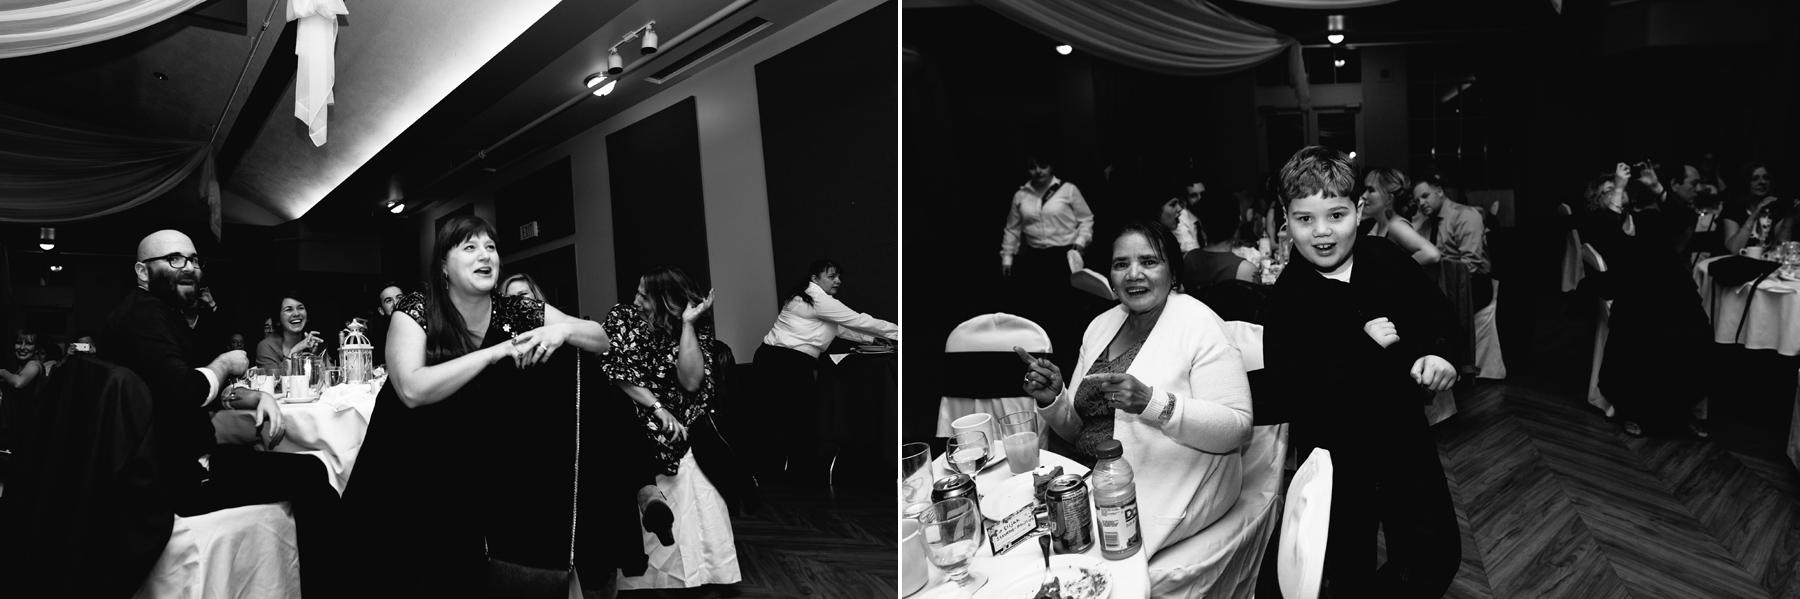 060-fredericton-wedding-photographer-kandisebrown-em2017